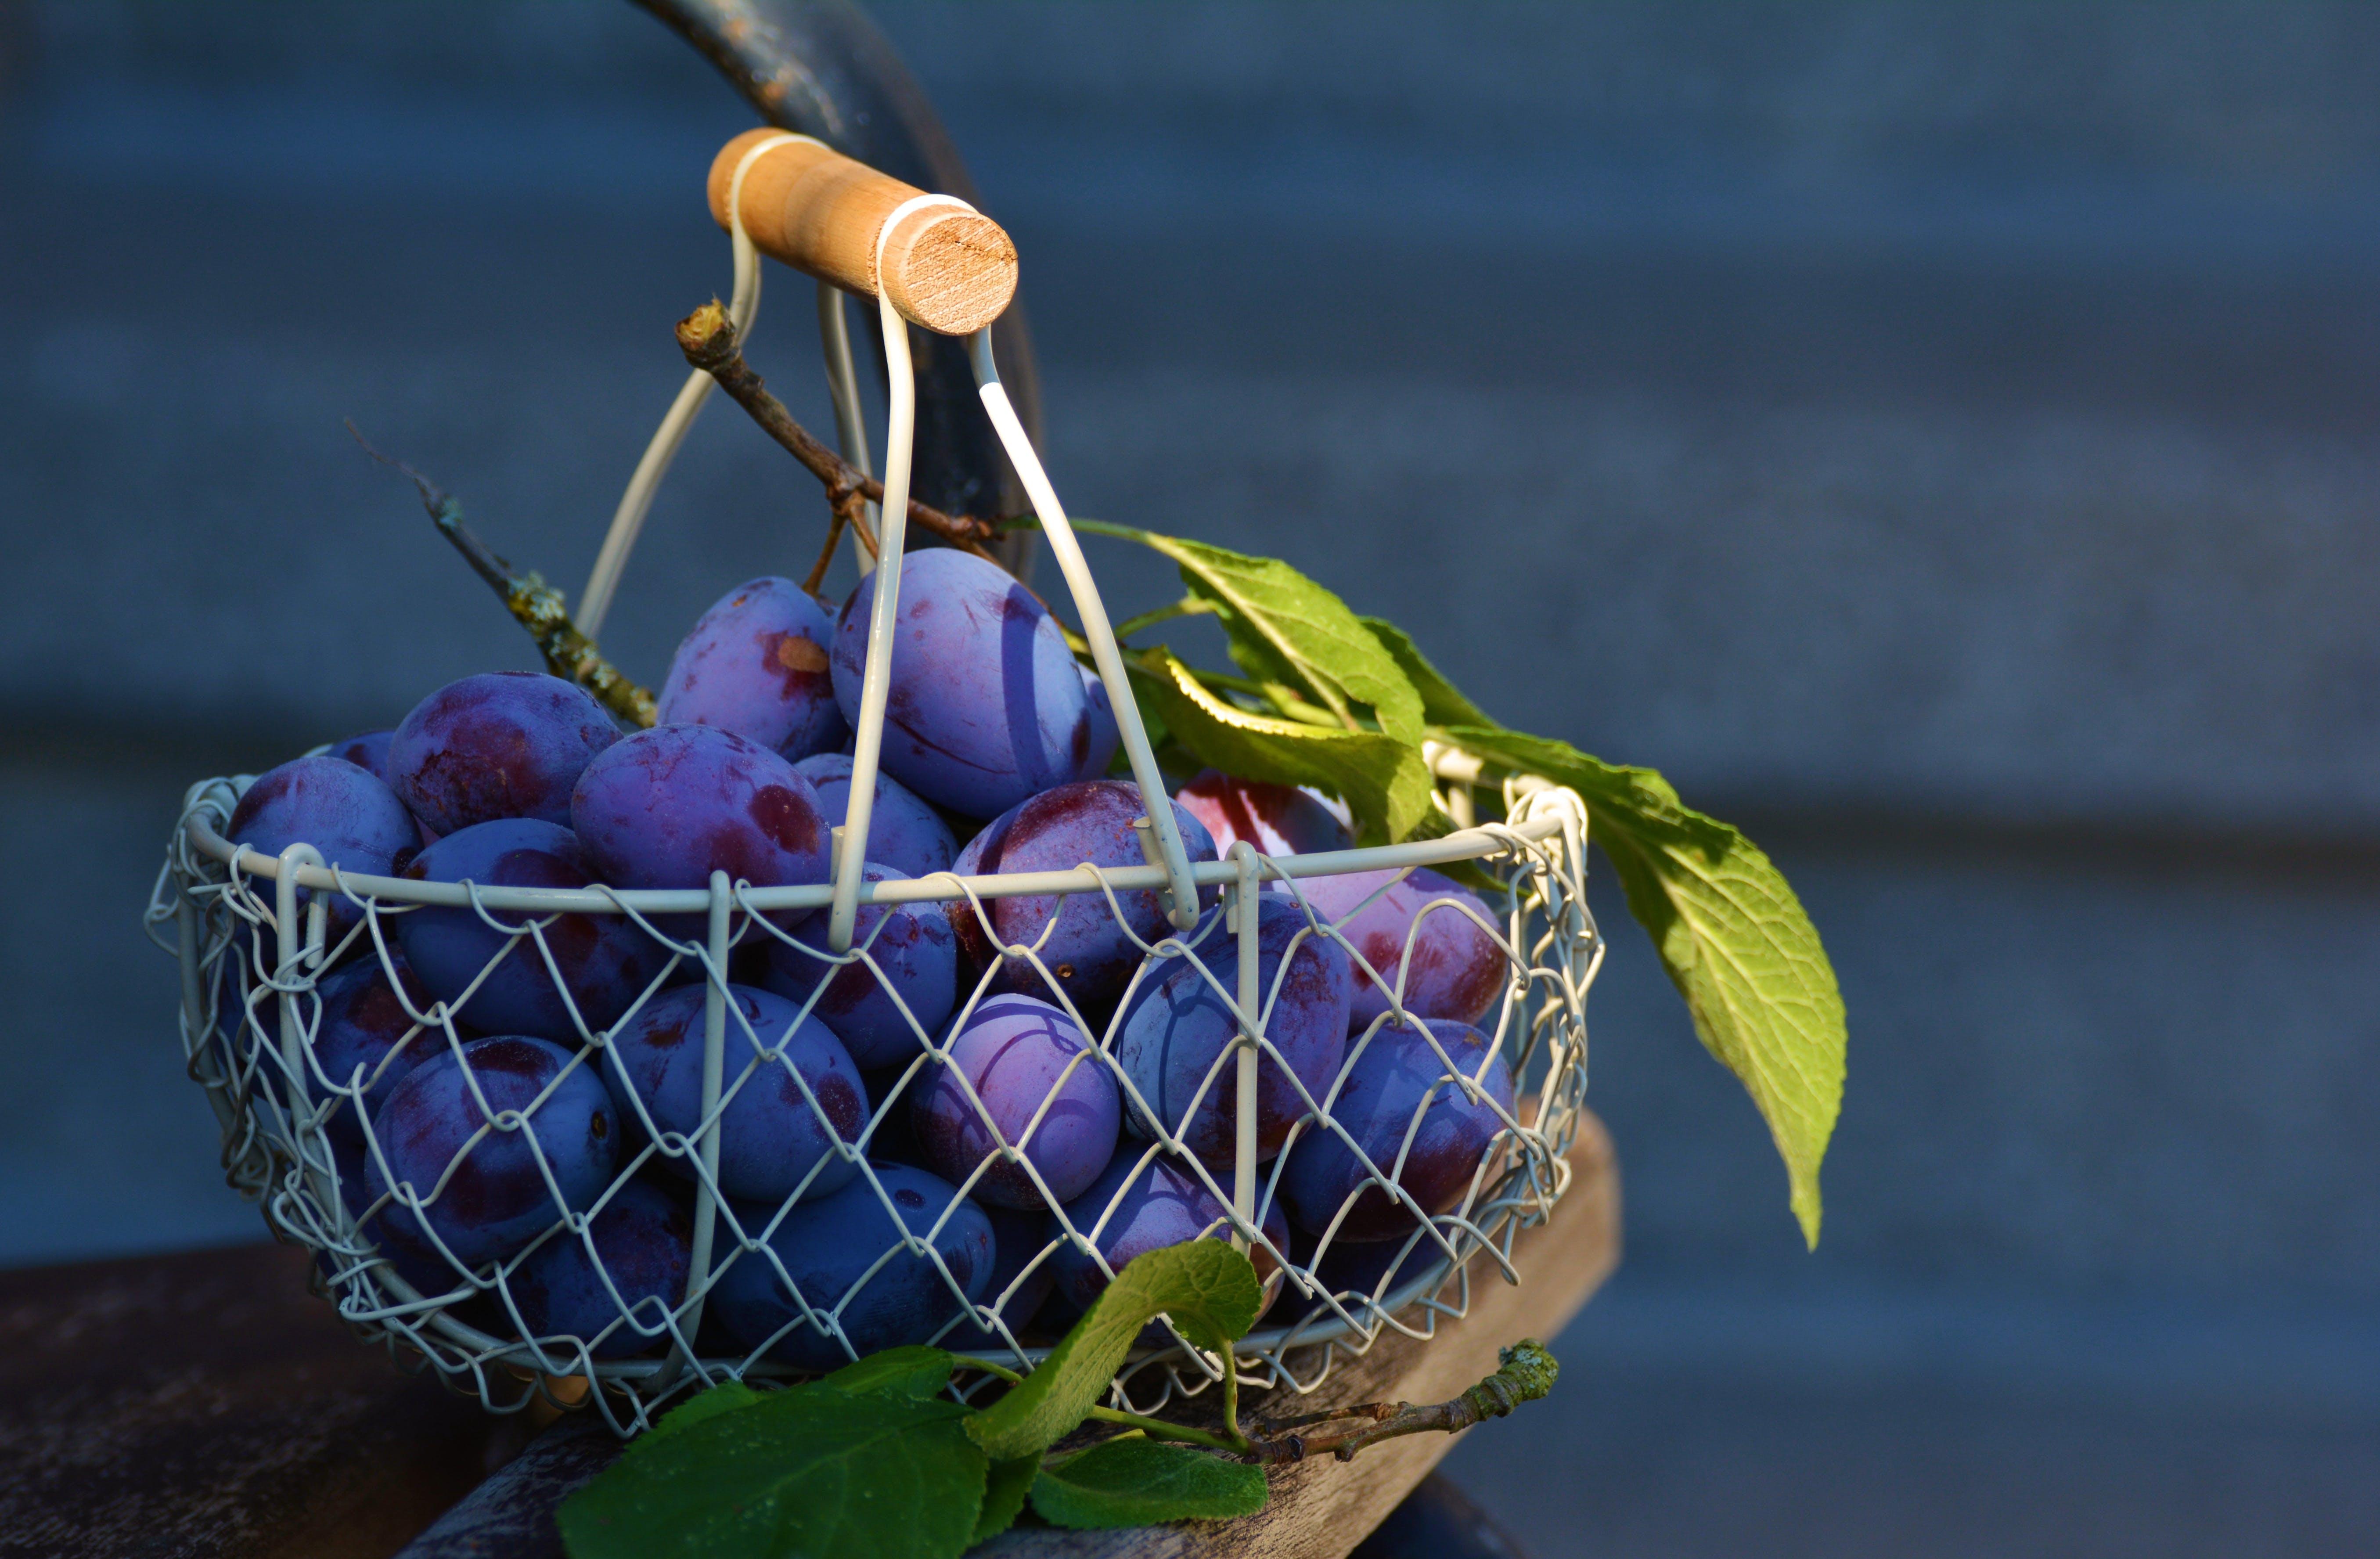 Red Grape Fruits on Metal Basket